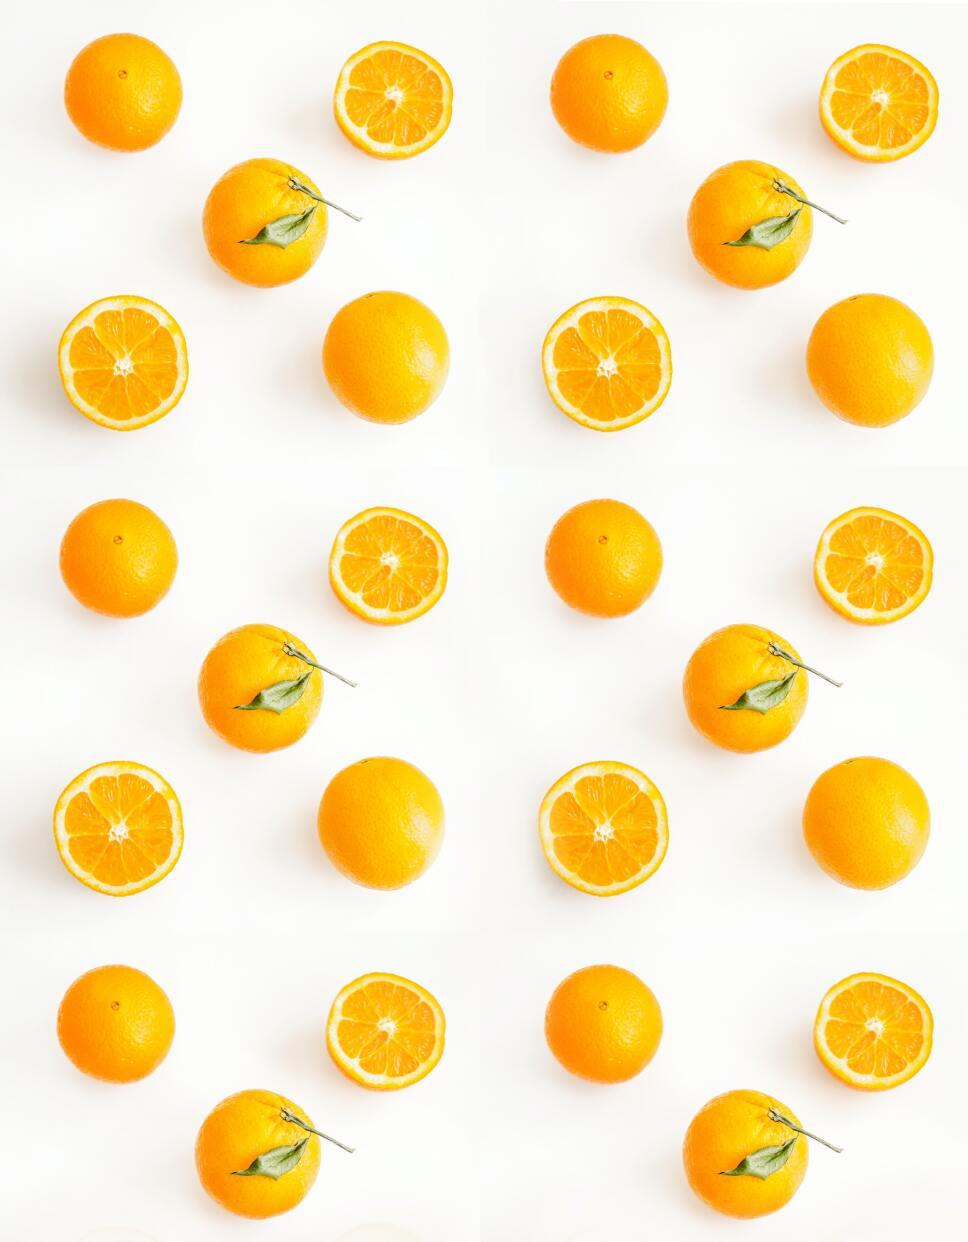 Tomar vitamina C, D y zinc para enfrentar el coronavirus.jpg